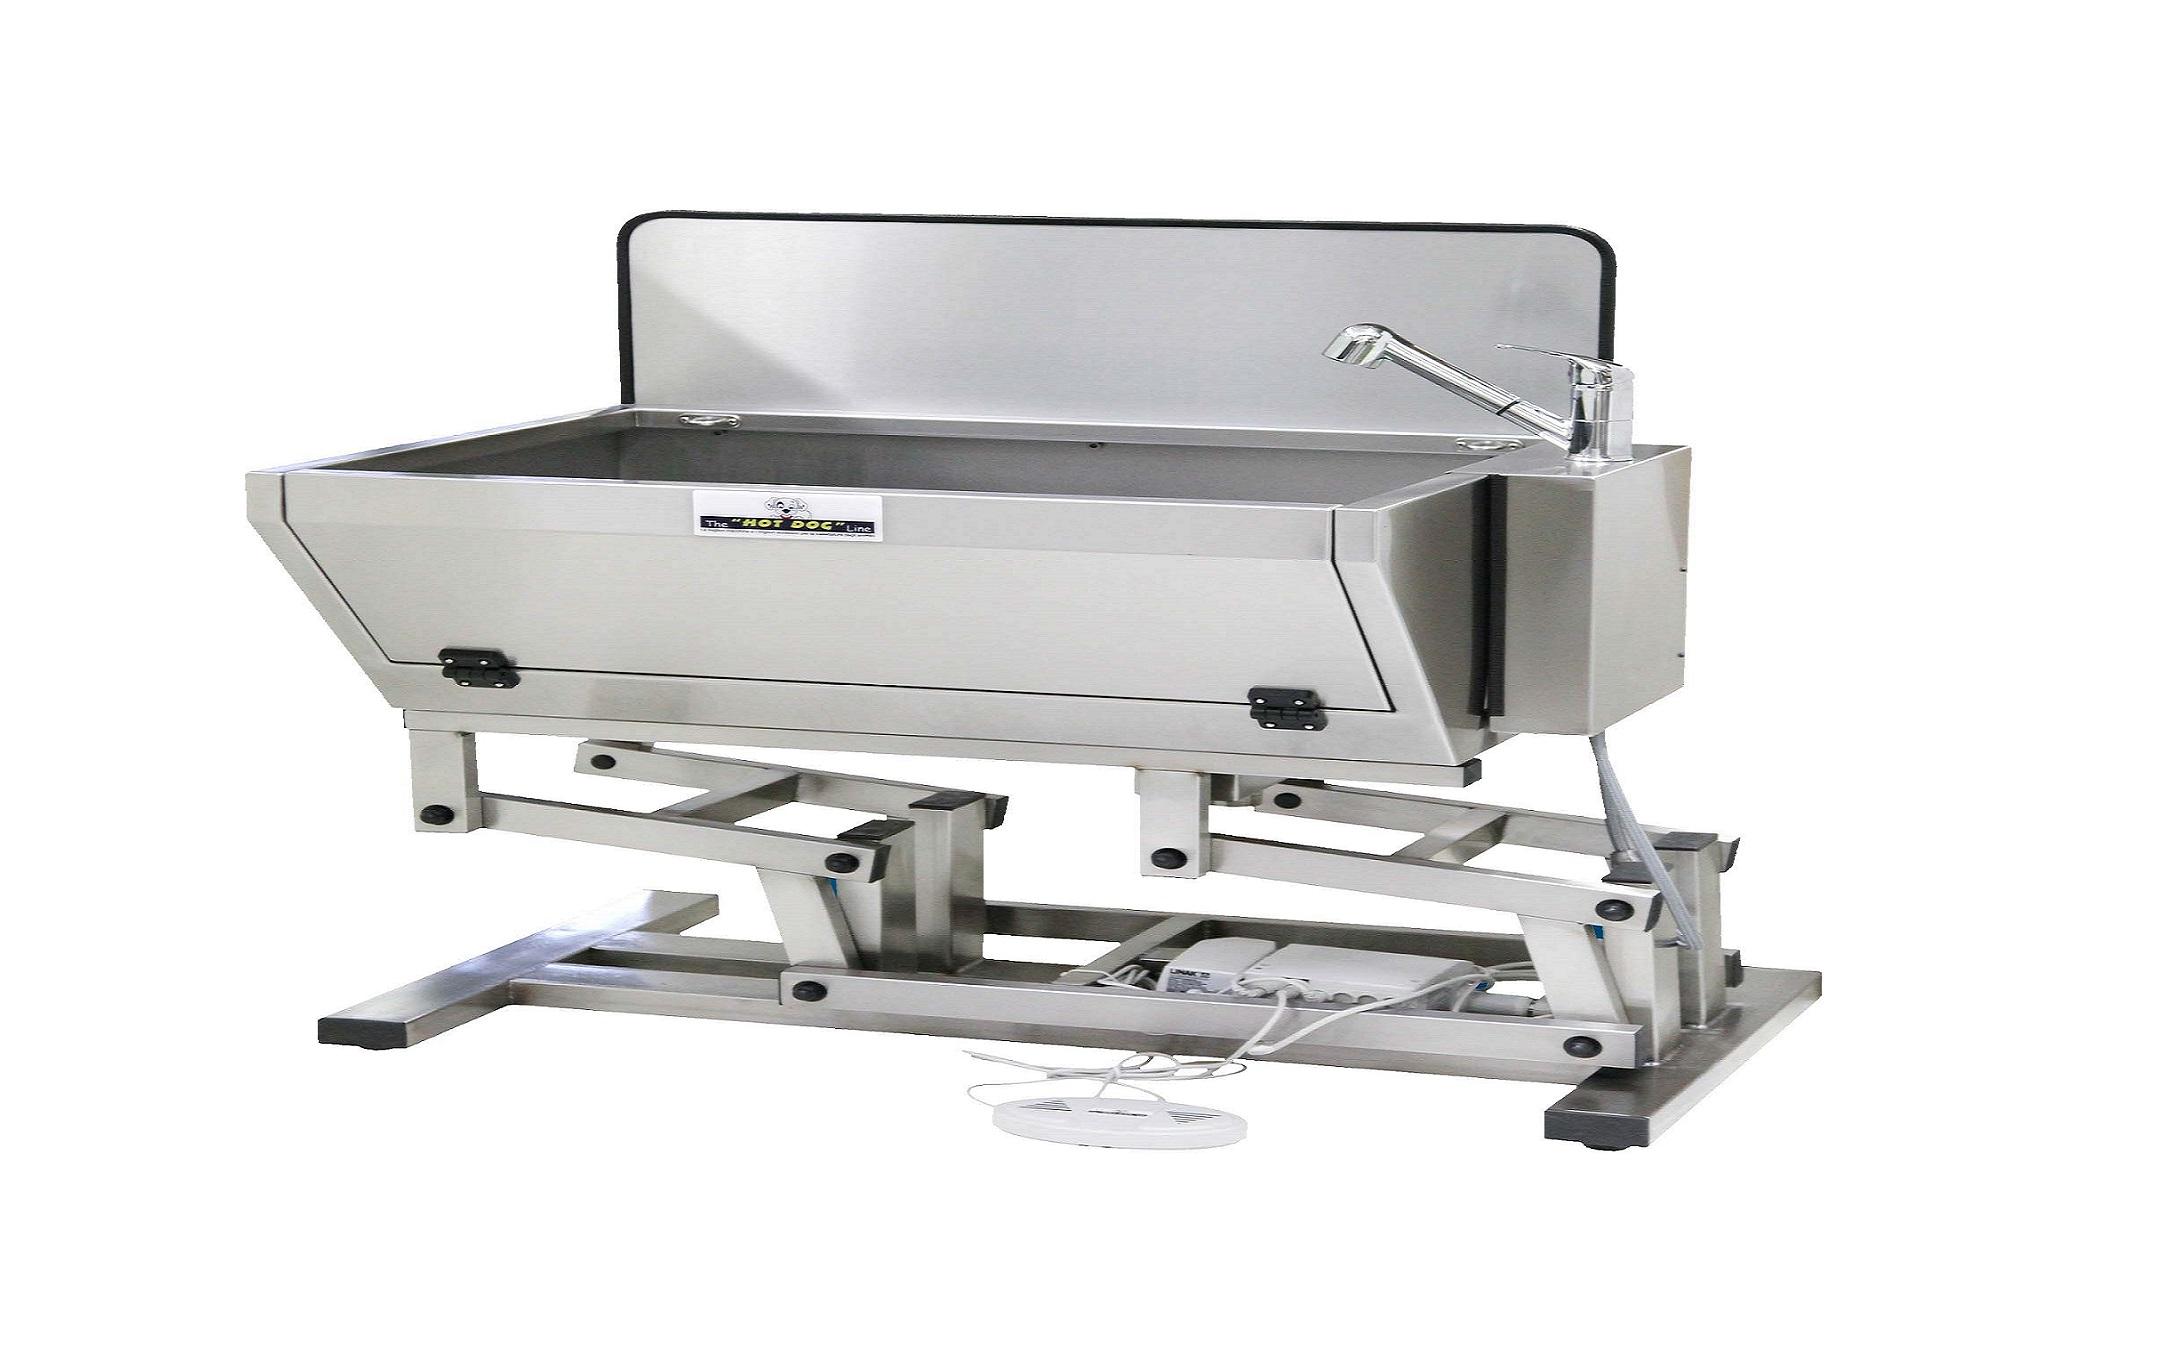 Vasca Da Toelettatura : Bts e in acciaio inox elettrico toelettatura vasche produttori